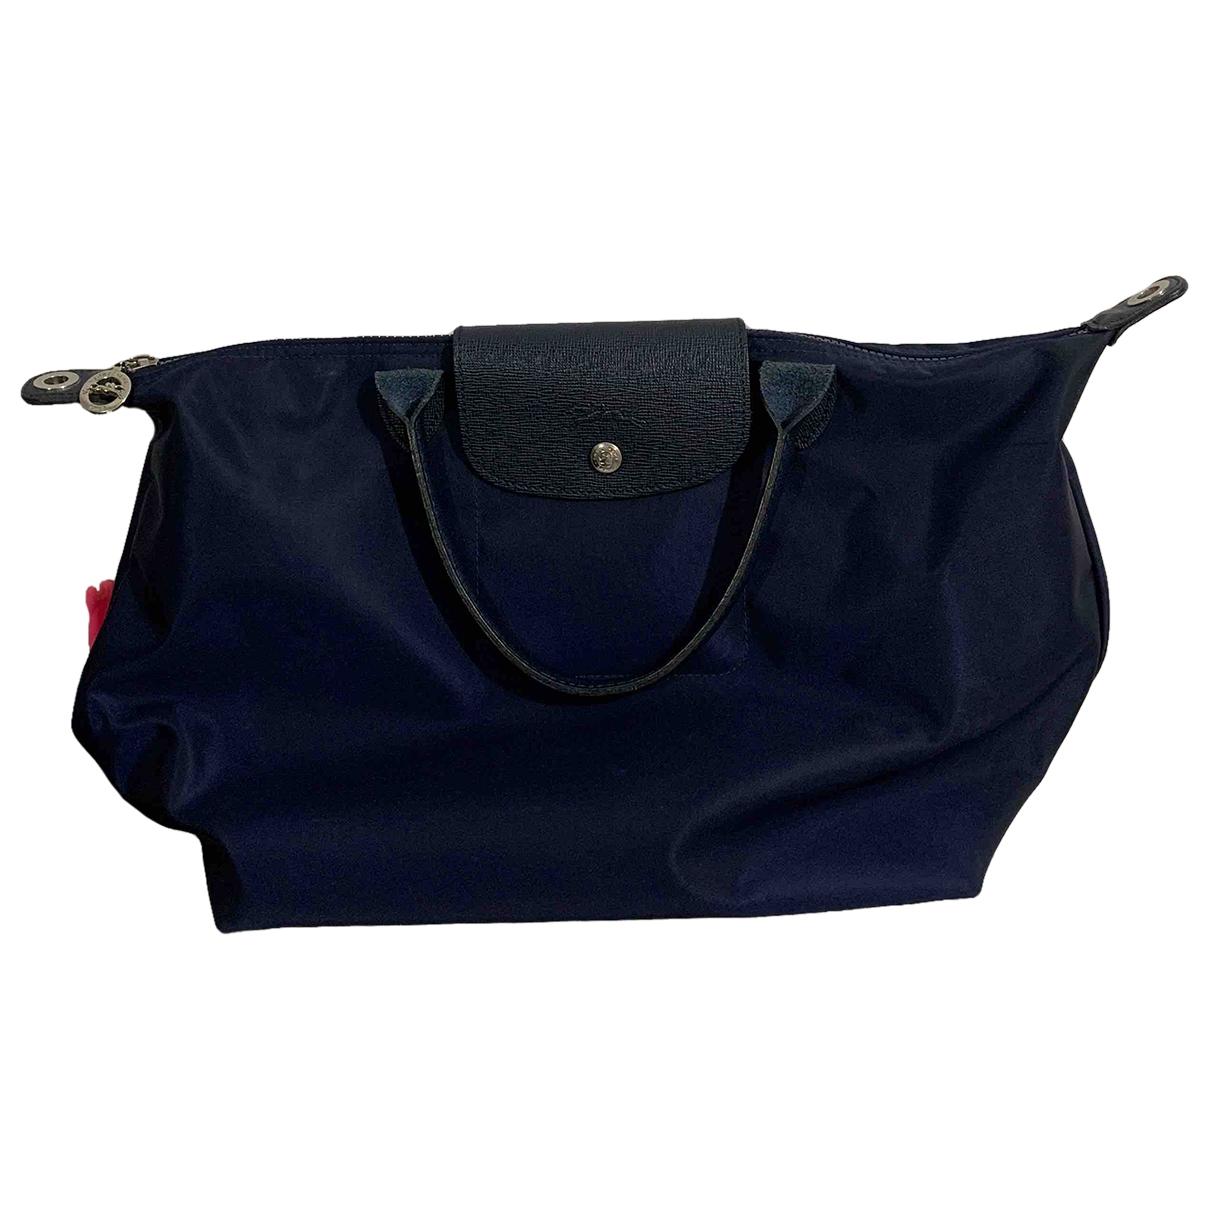 Longchamp Pliage  Handtasche in  Blau Synthetik